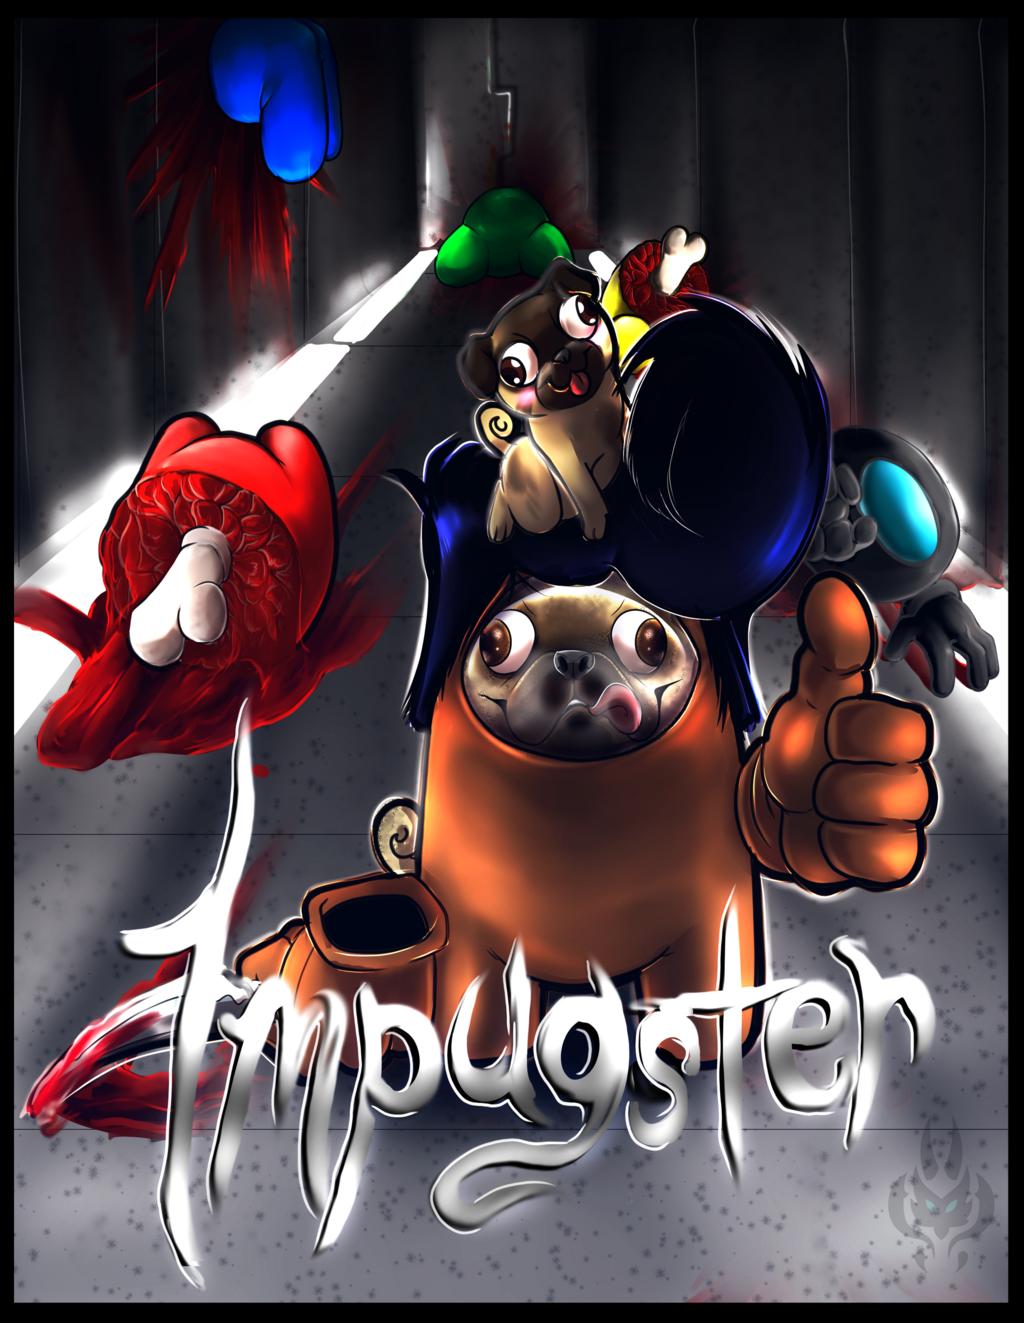 The Impugster